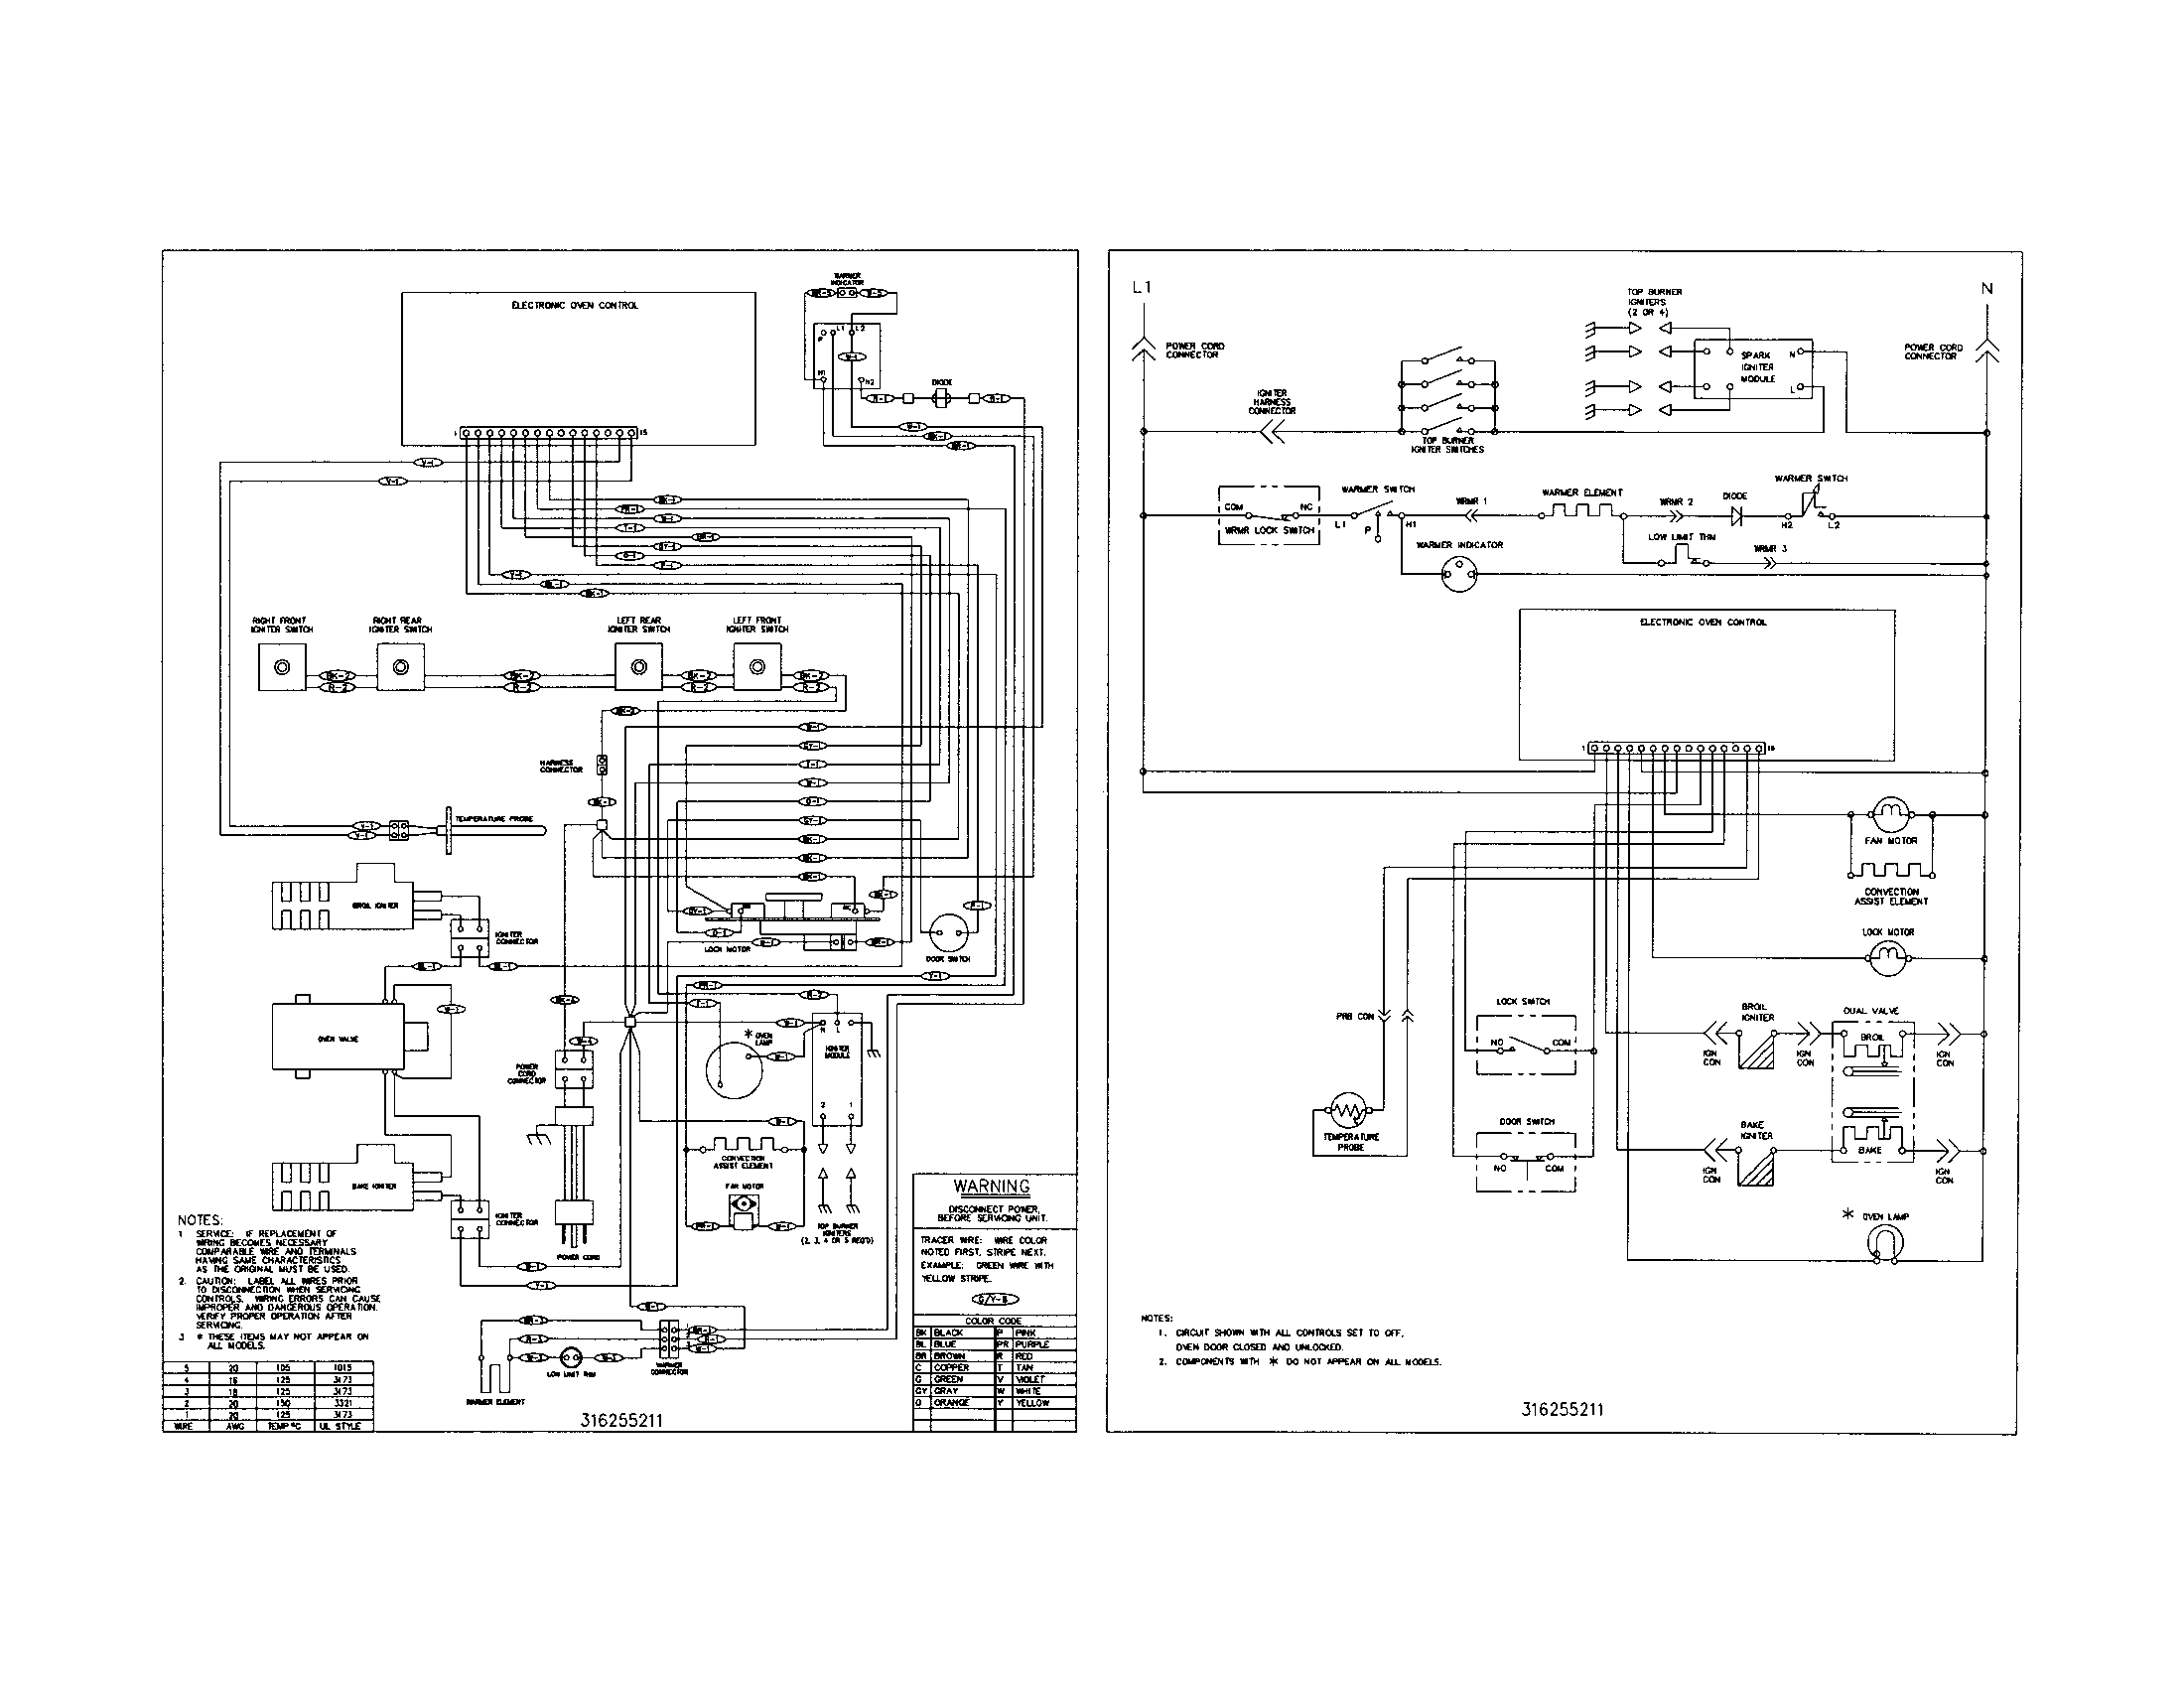 wiring schematic parts?resize=665%2C513&ssl=1 frigidaire dryer timer wiring diagram wiring diagram frigidaire gallery dryer timer wiring diagram at bakdesigns.co